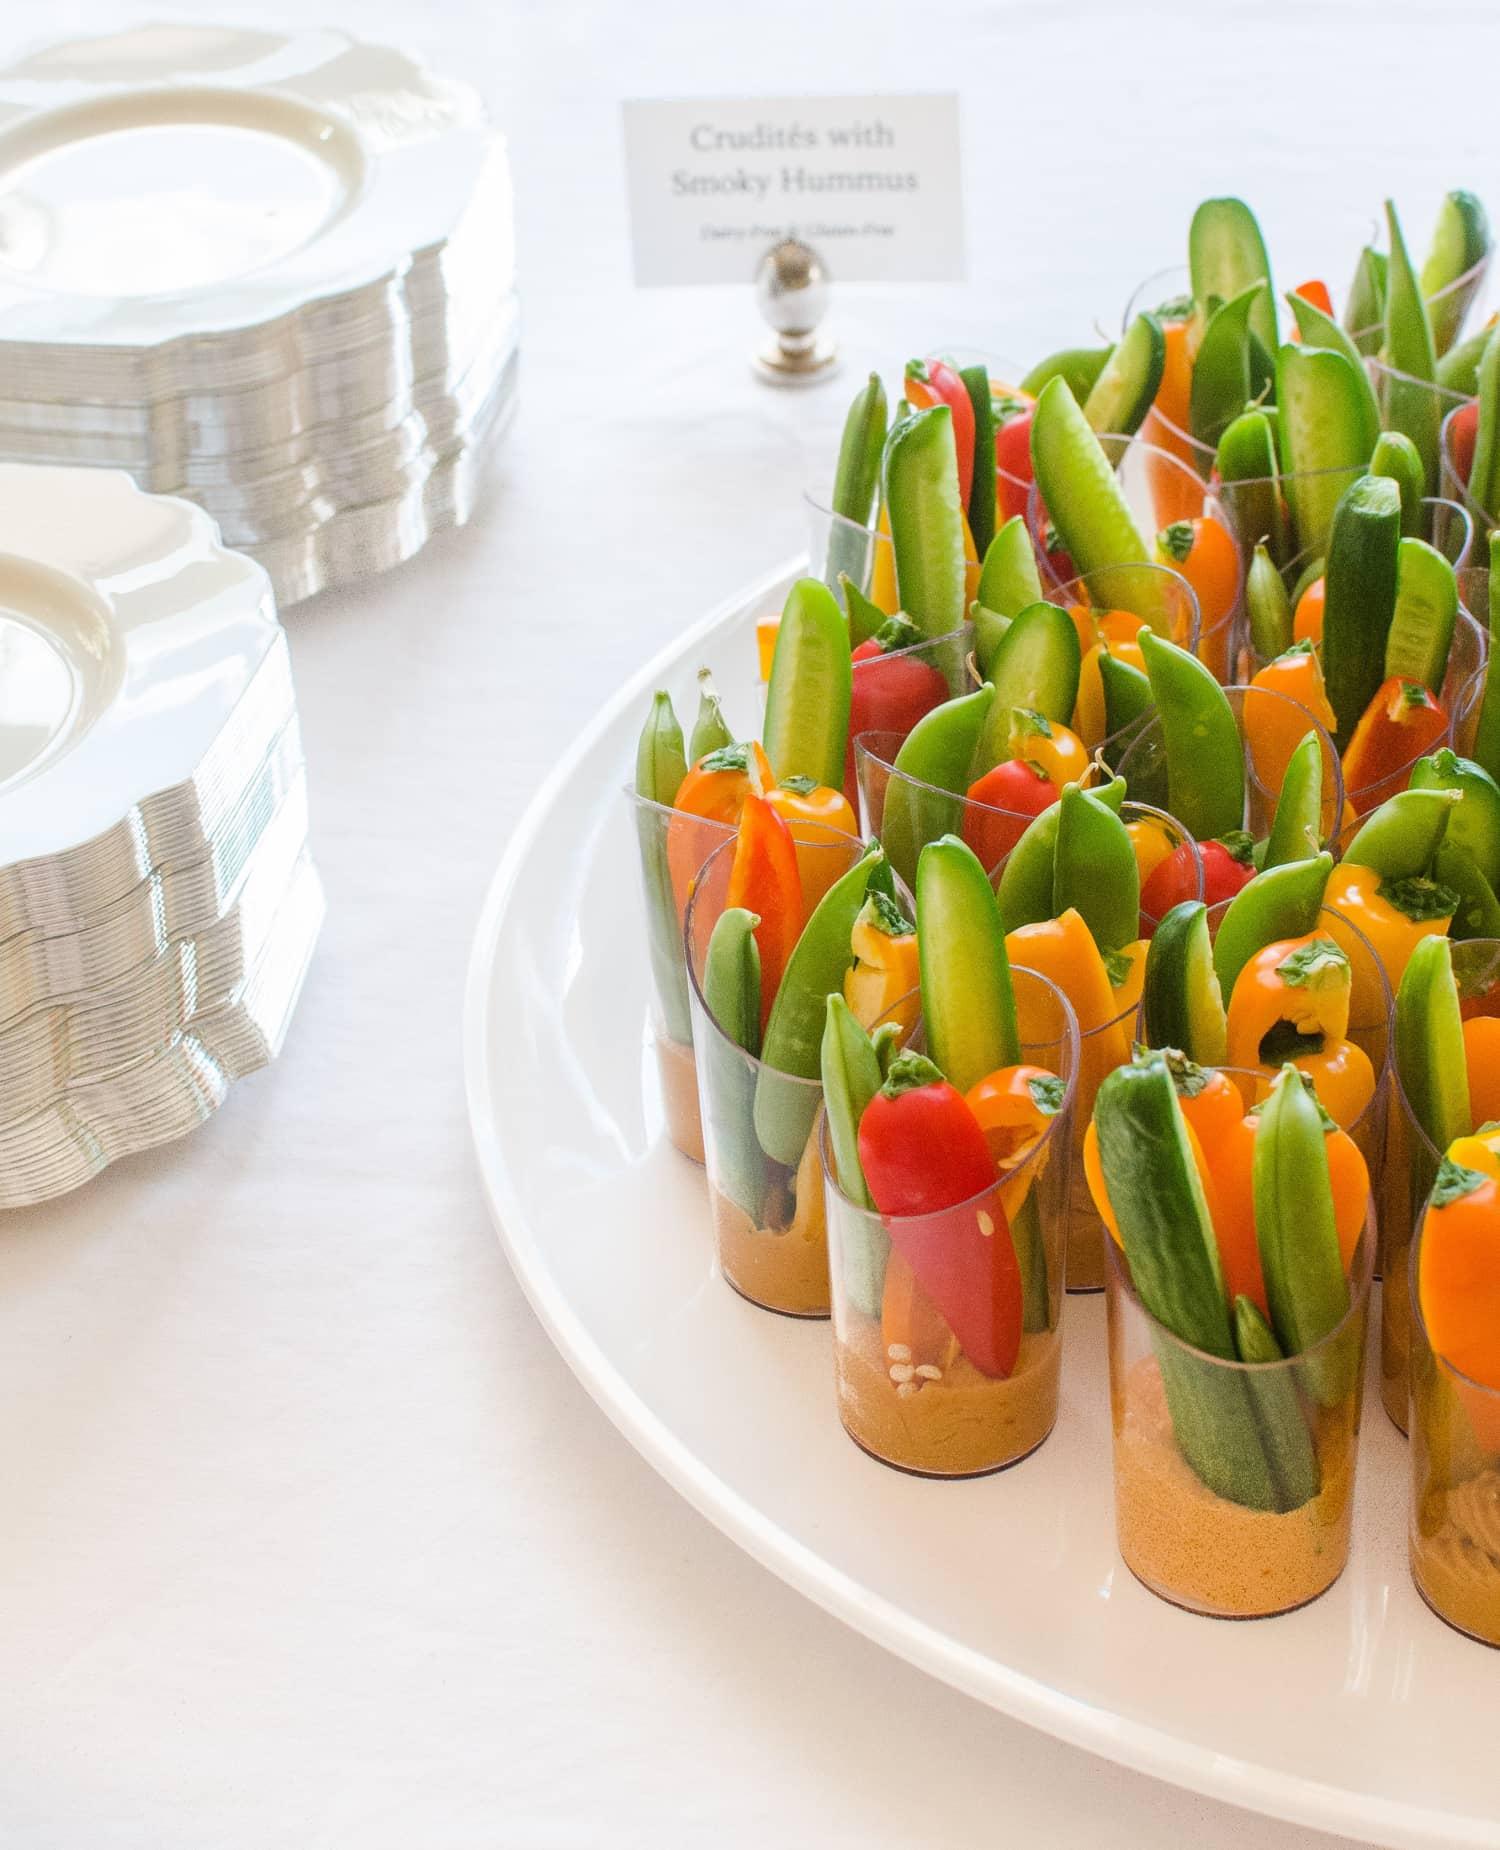 Diy Wedding Food: A DIY Wedding Reception For 200: The Party Plan